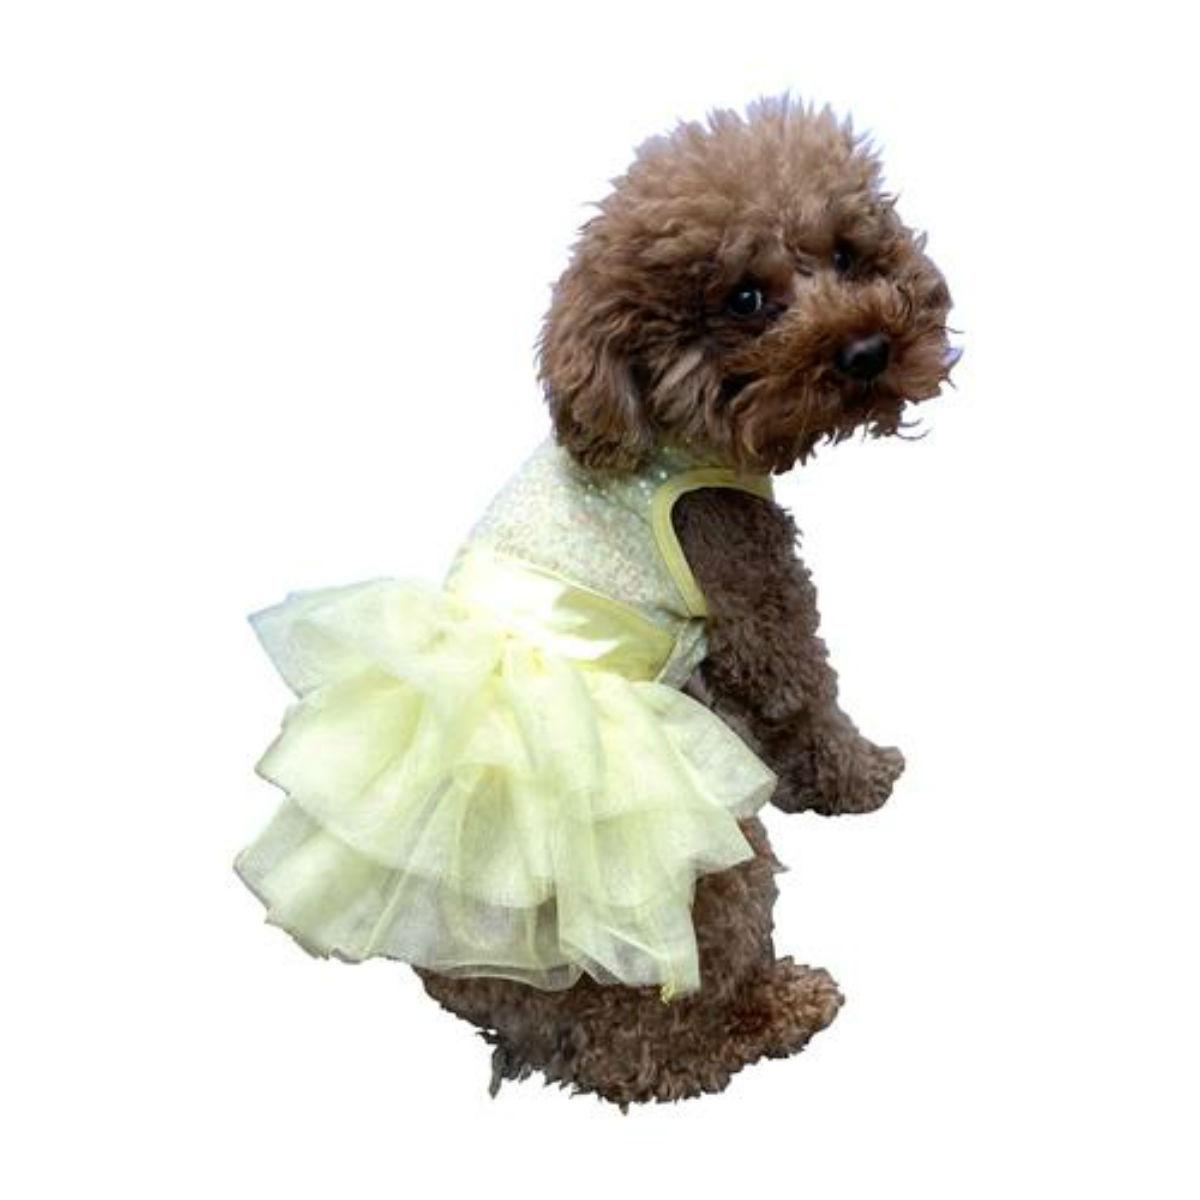 The Dog Squad's Fufu Tutu Zsa Zsa Sequin Dog Dress - Lemon